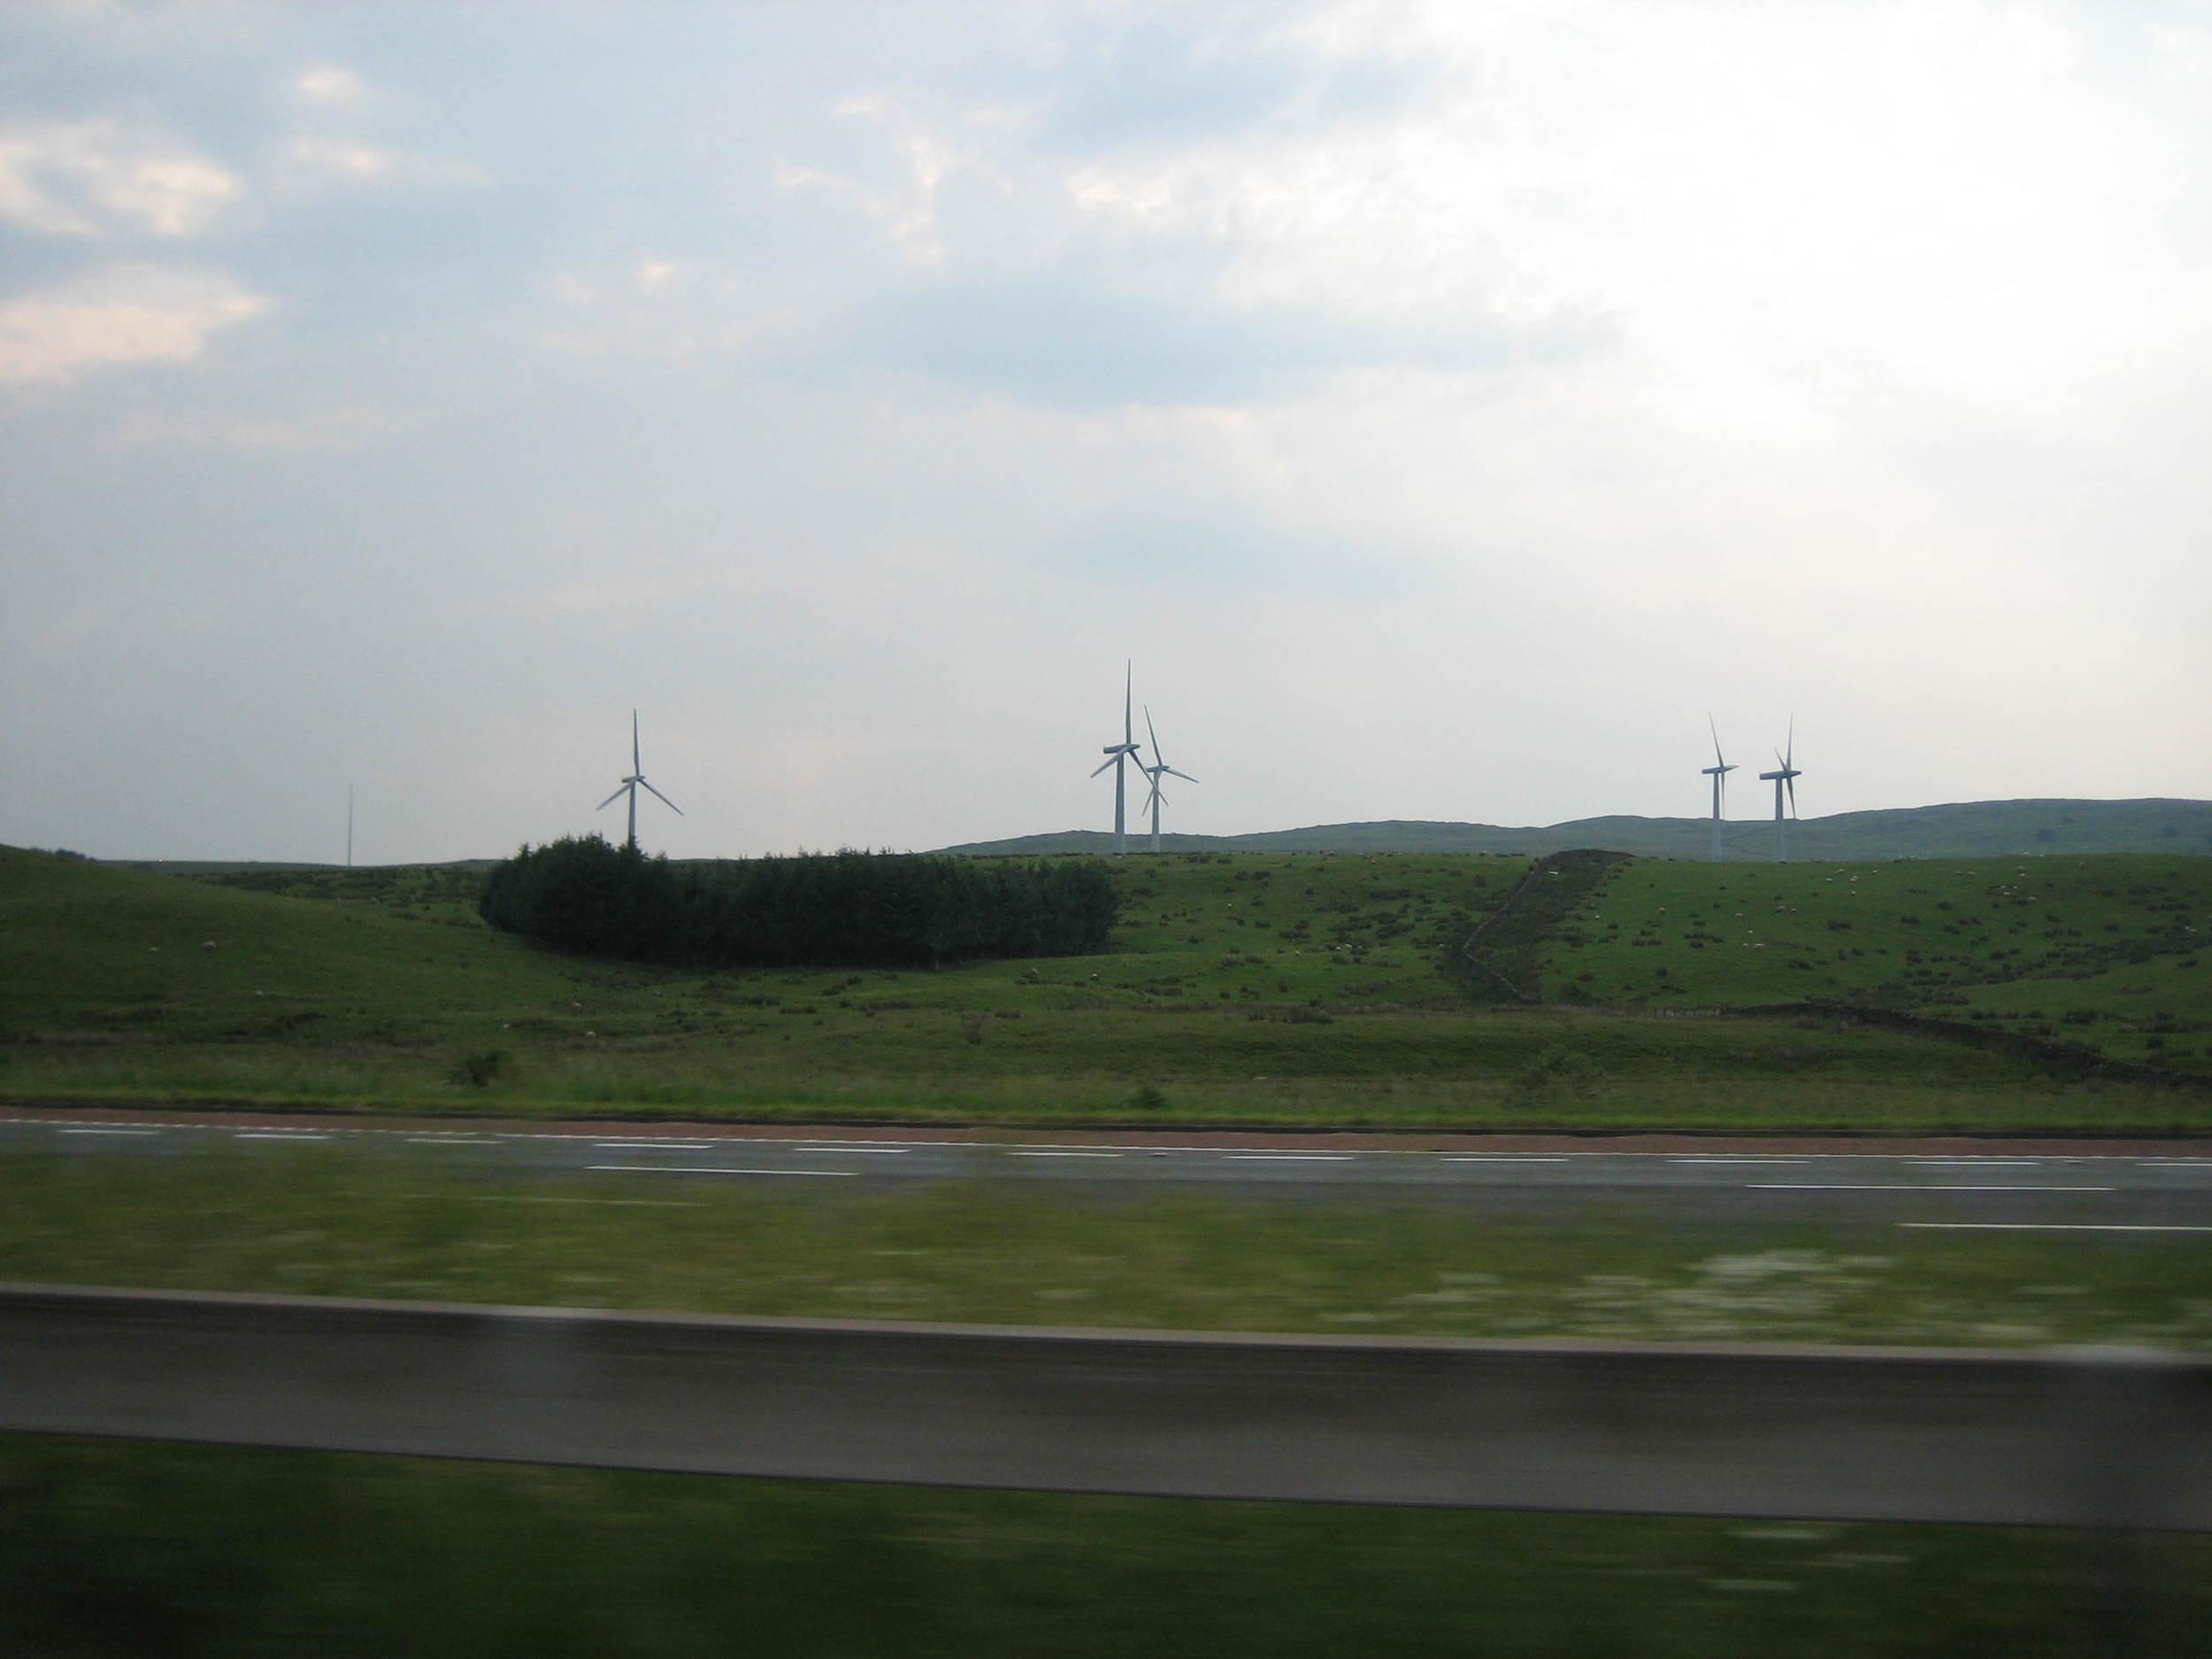 Large wind turbines (2MW) - M72.JPG